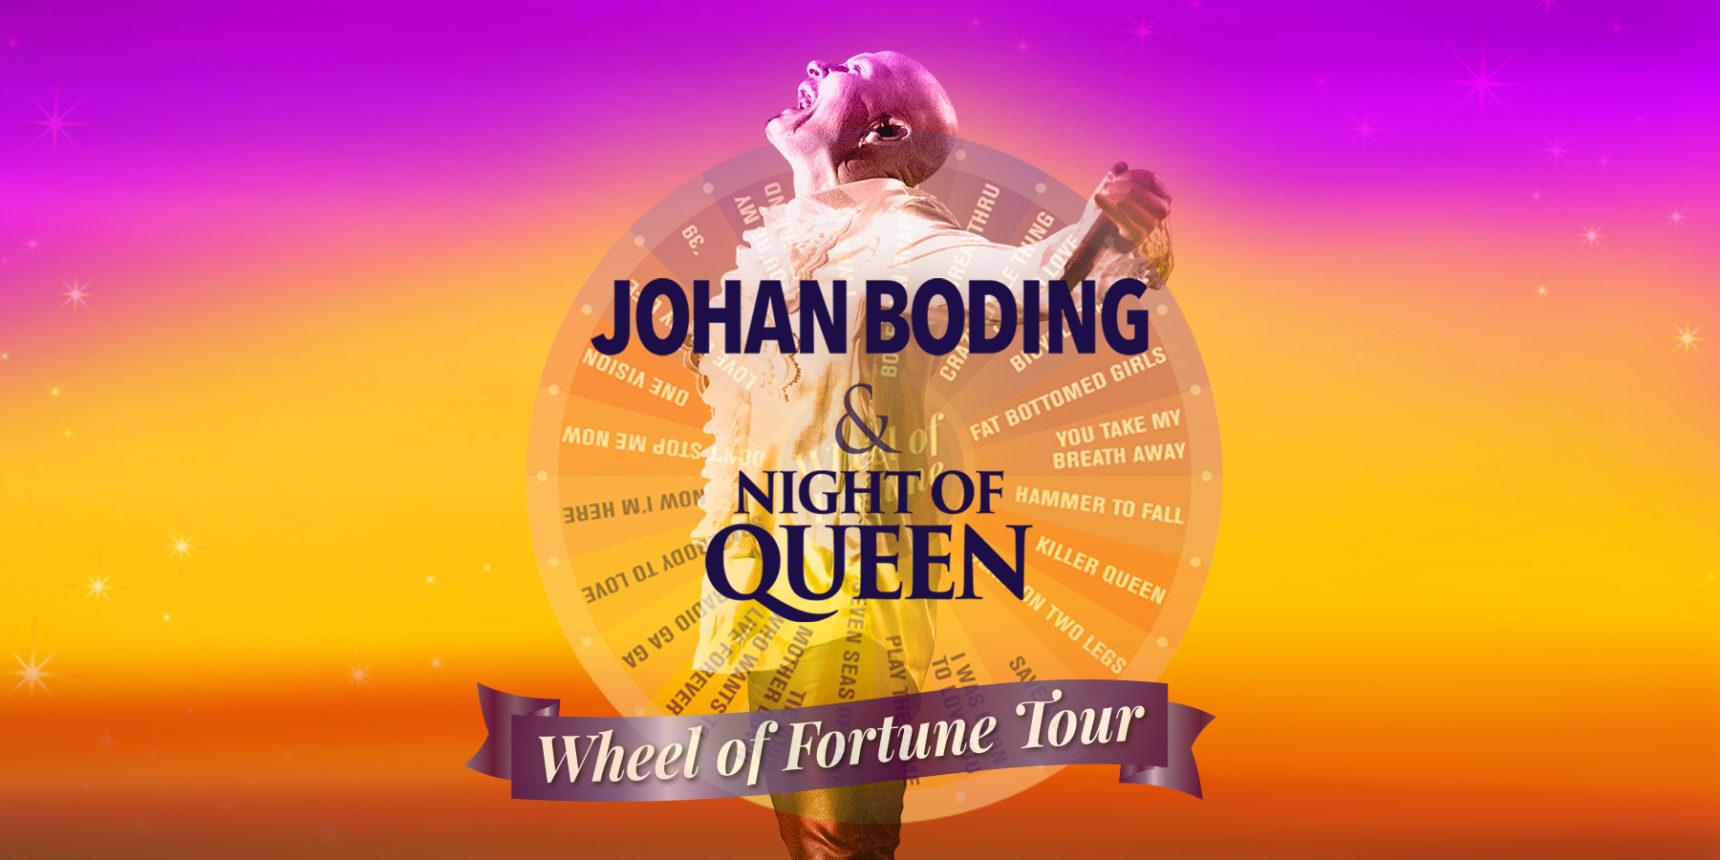 Johan Boding